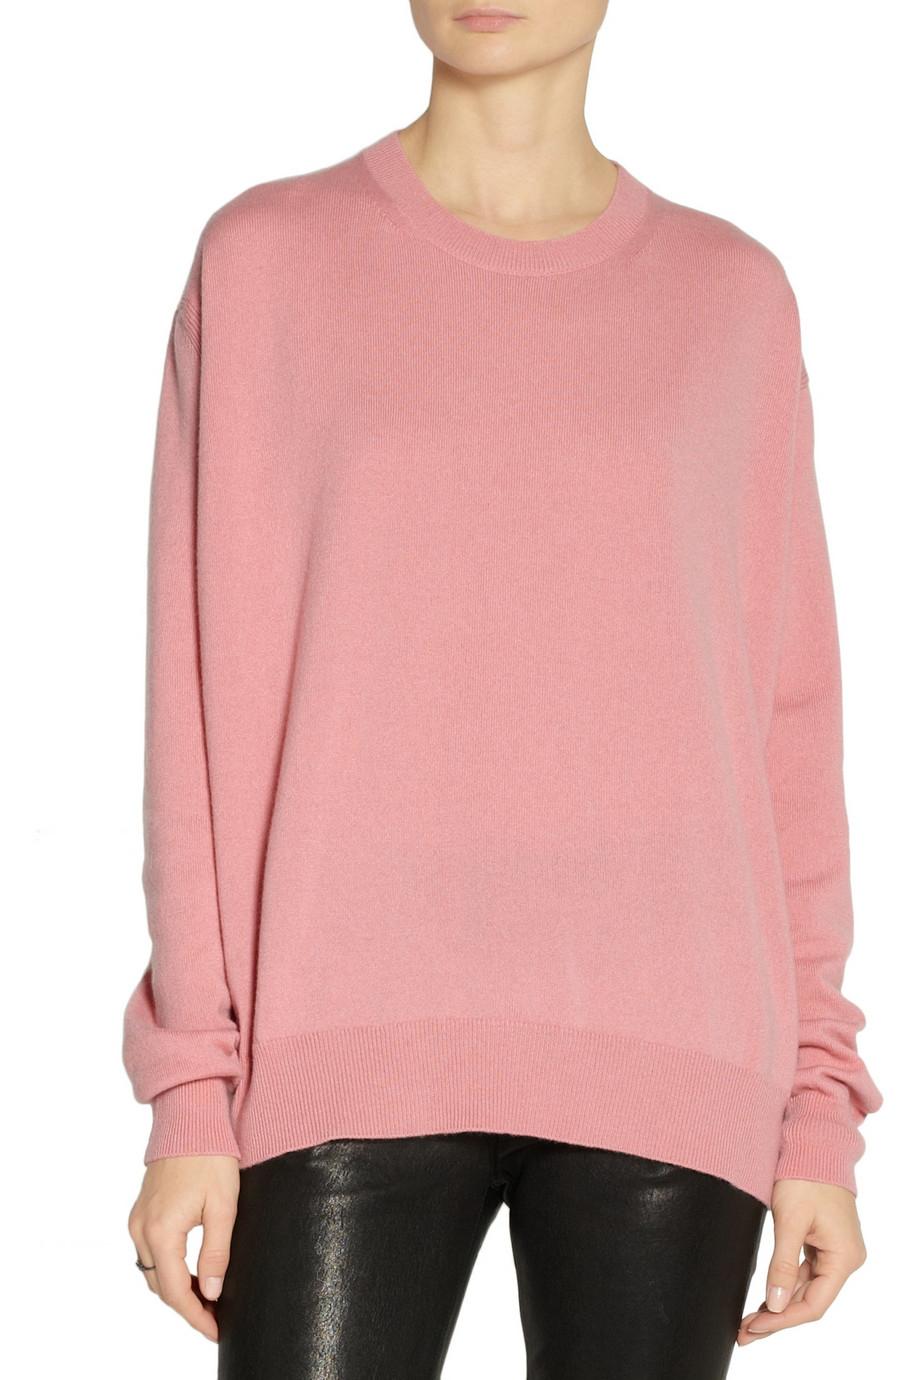 Jil sander Cashmere Sweater in Pink | Lyst